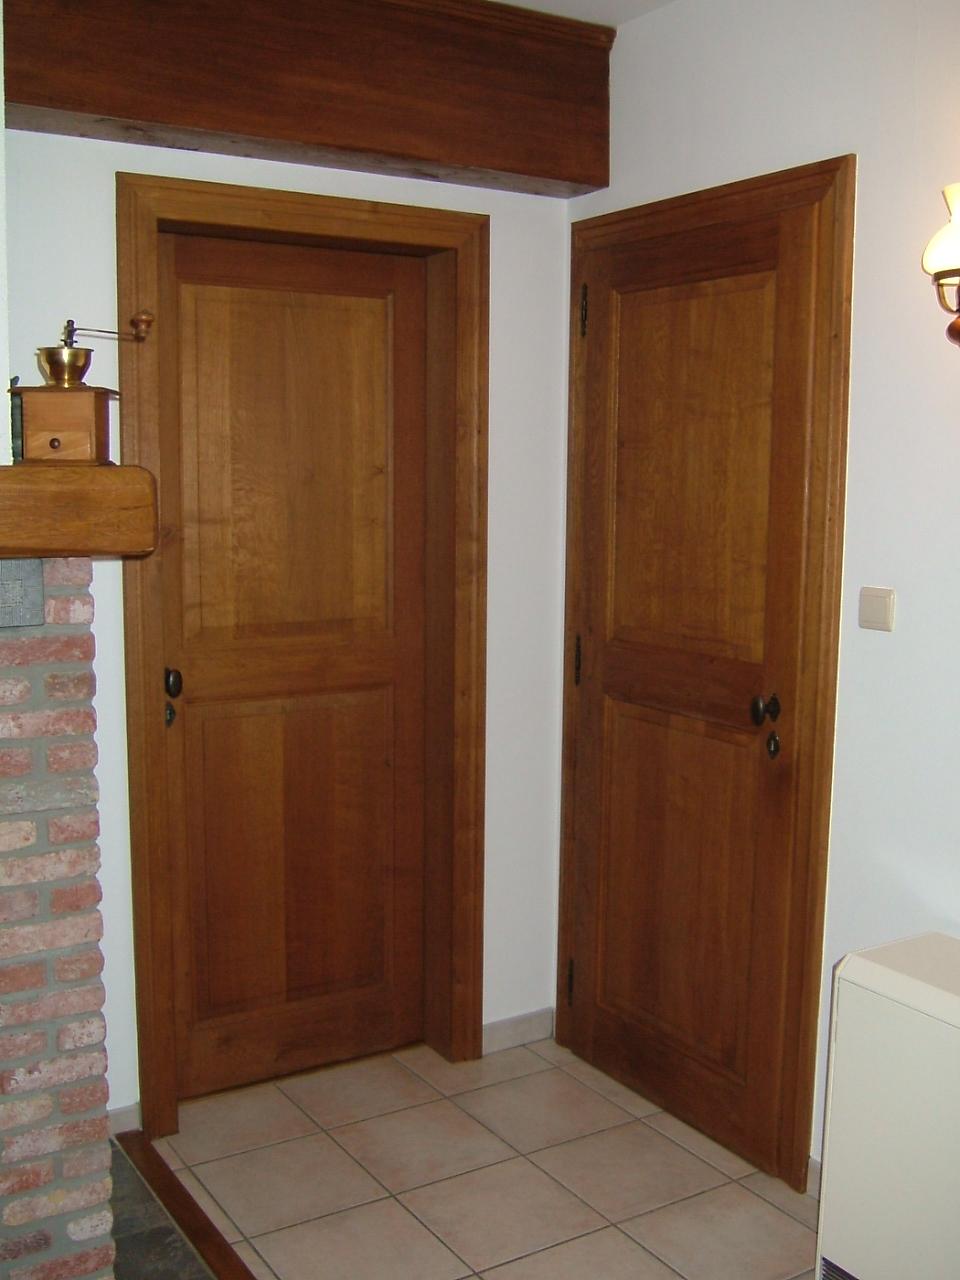 Menuiserie int rieure menuiserie de clercq for Menuiserie porte interieure